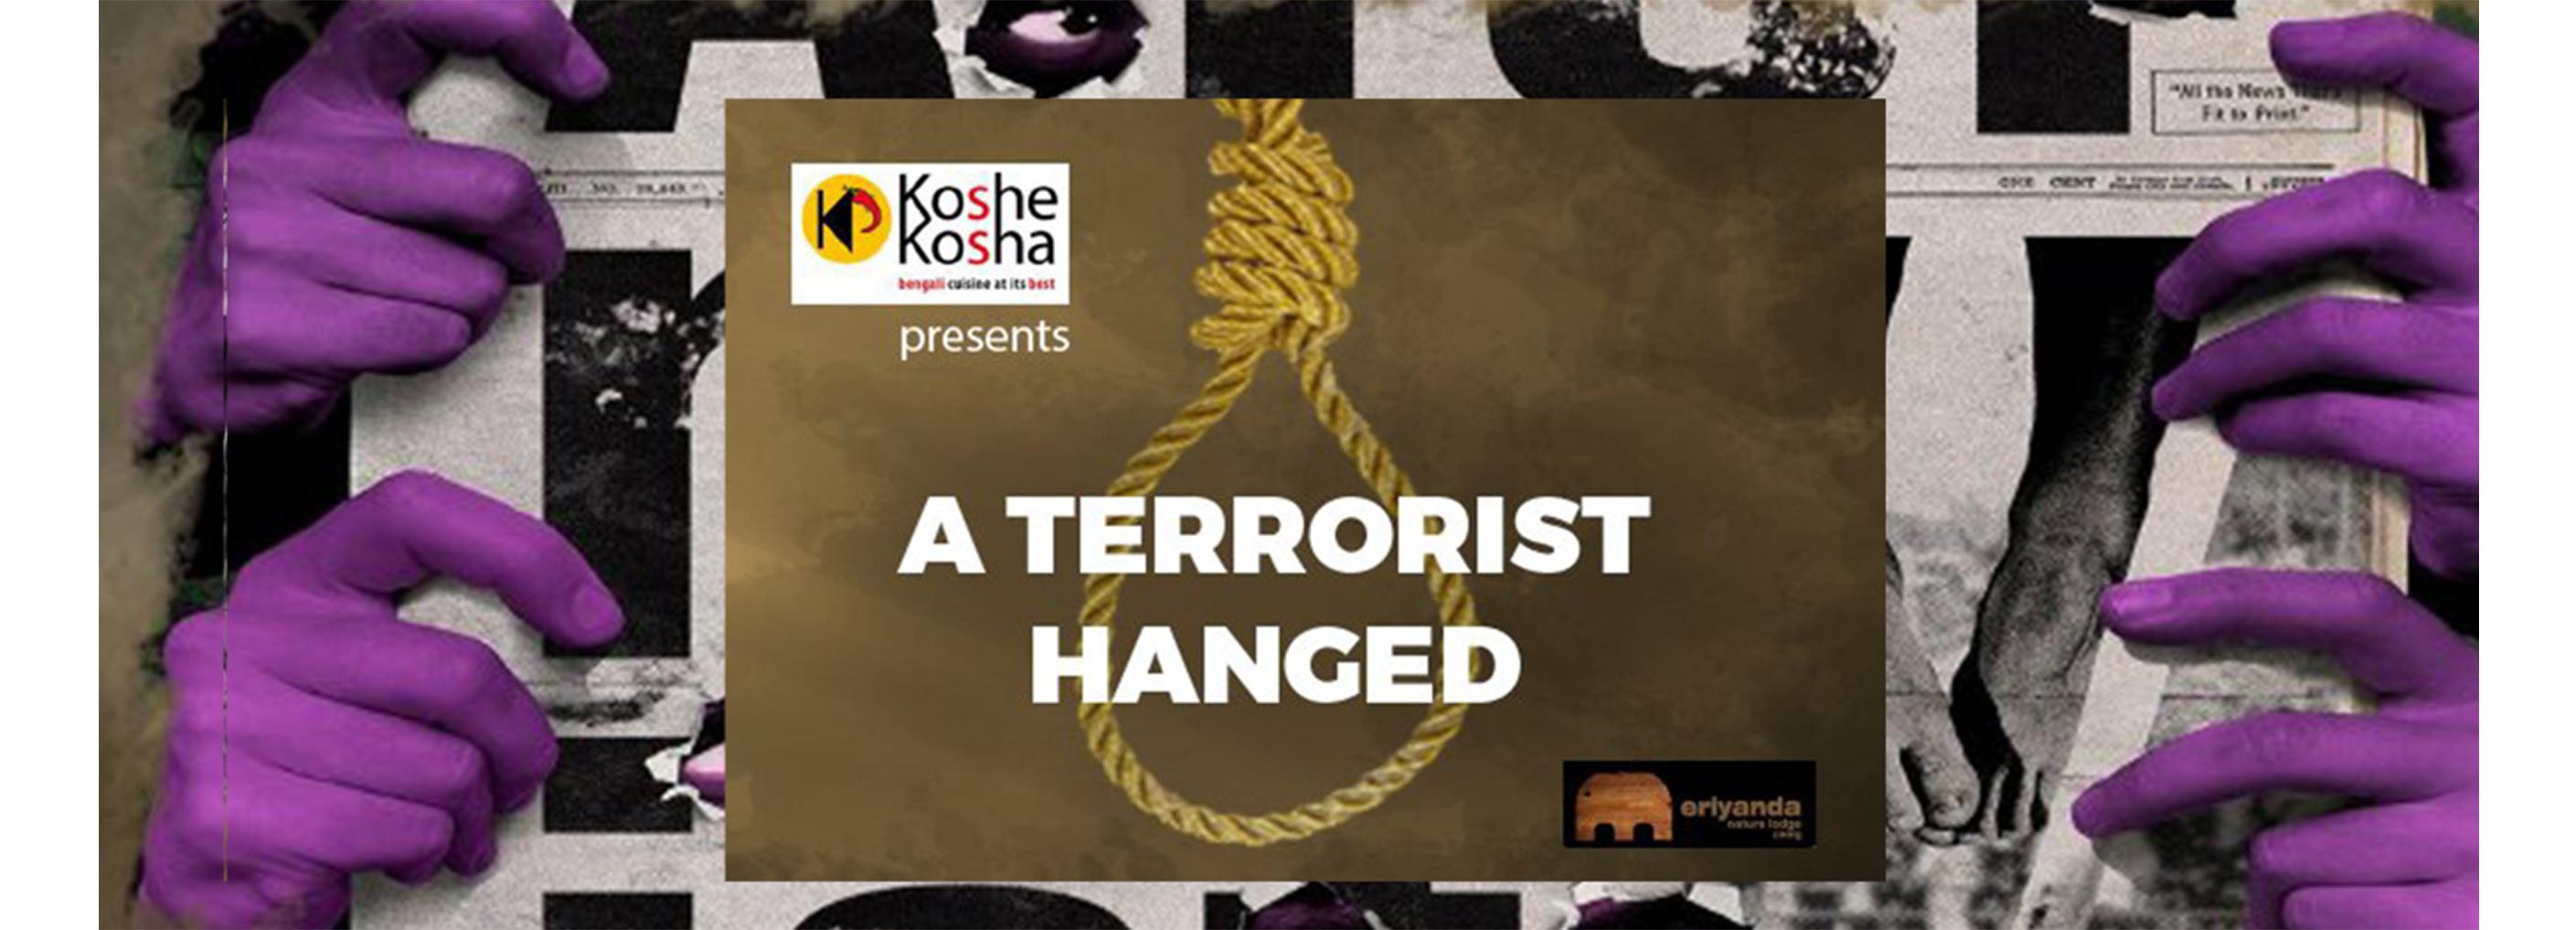 Forum-Three Presents (in collaboration with NSD Bengaluru) A TERRORIST HANGED